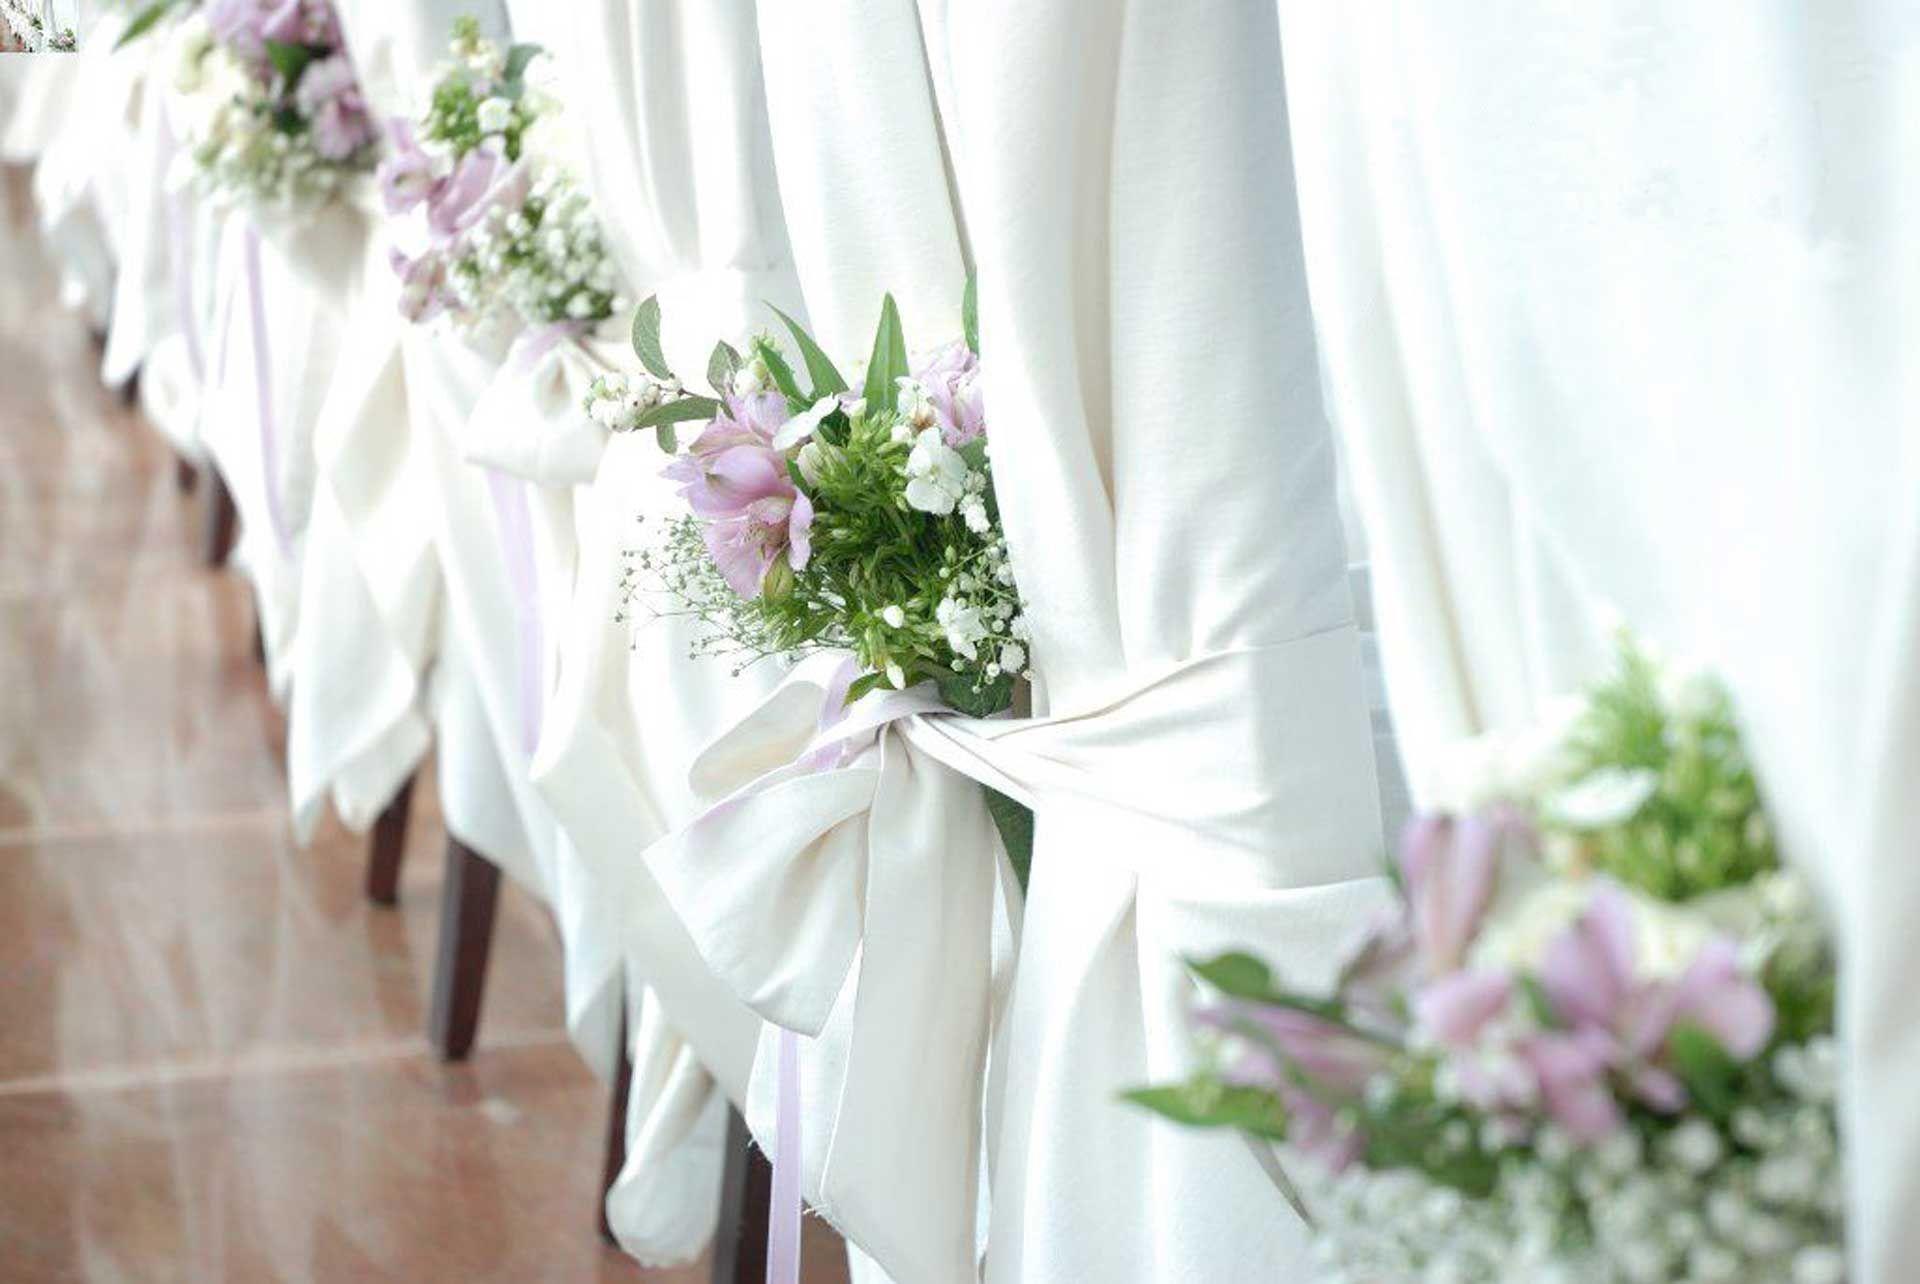 Sedie Matrimonio ~ Dettaglio allestimento tavoli e sedie matrimonio shabby chic